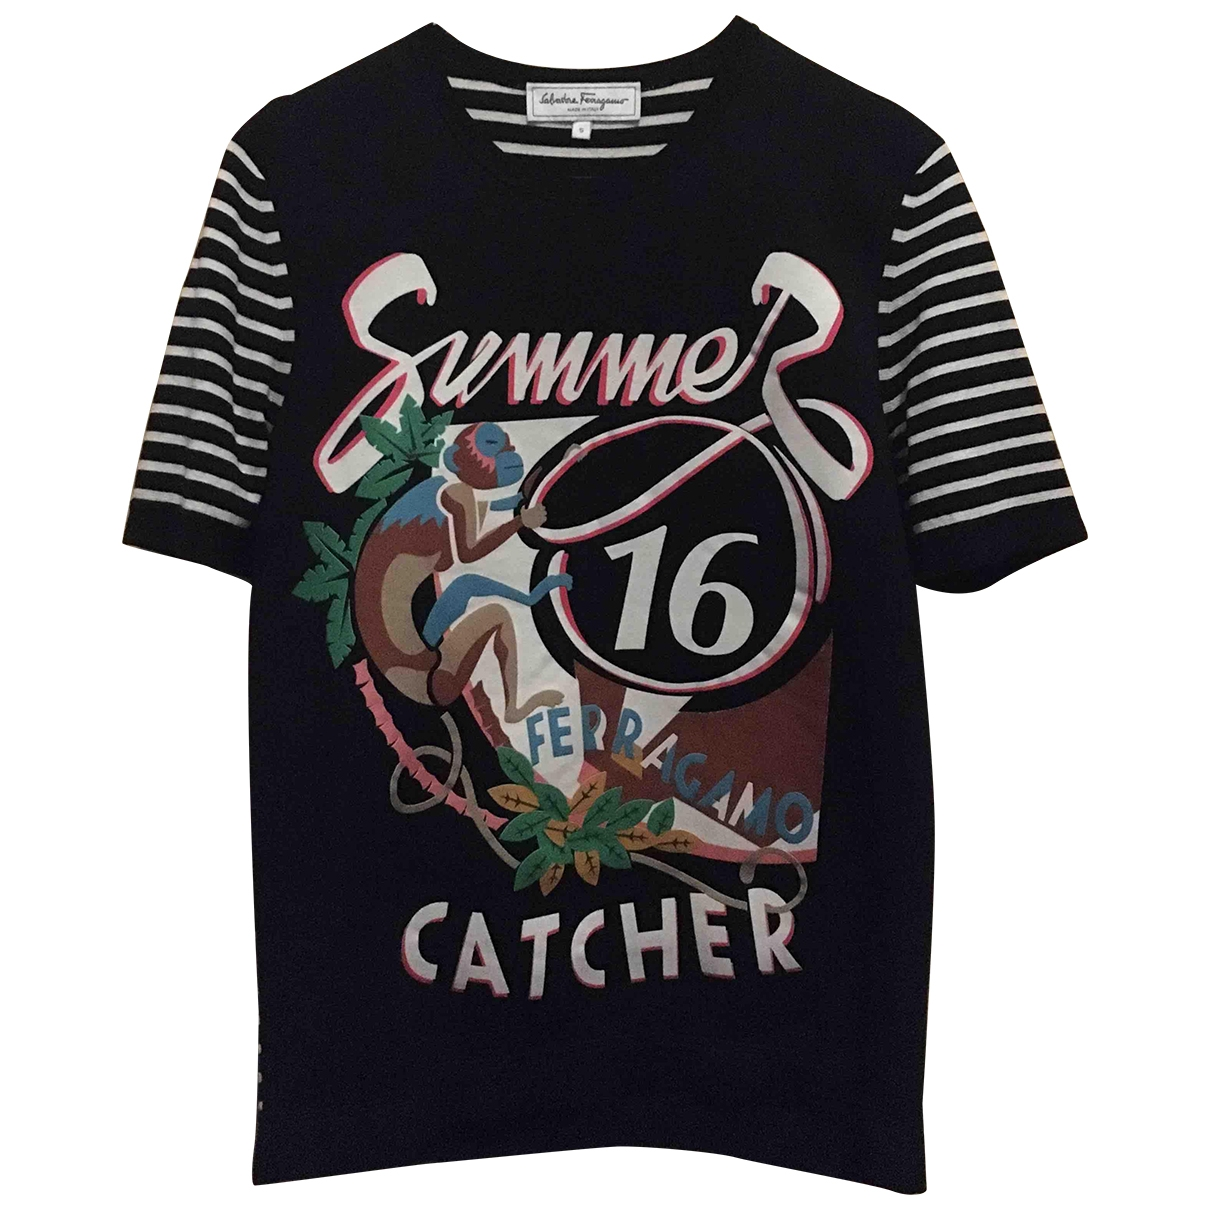 Salvatore Ferragamo \N Black T-shirts for Men S International